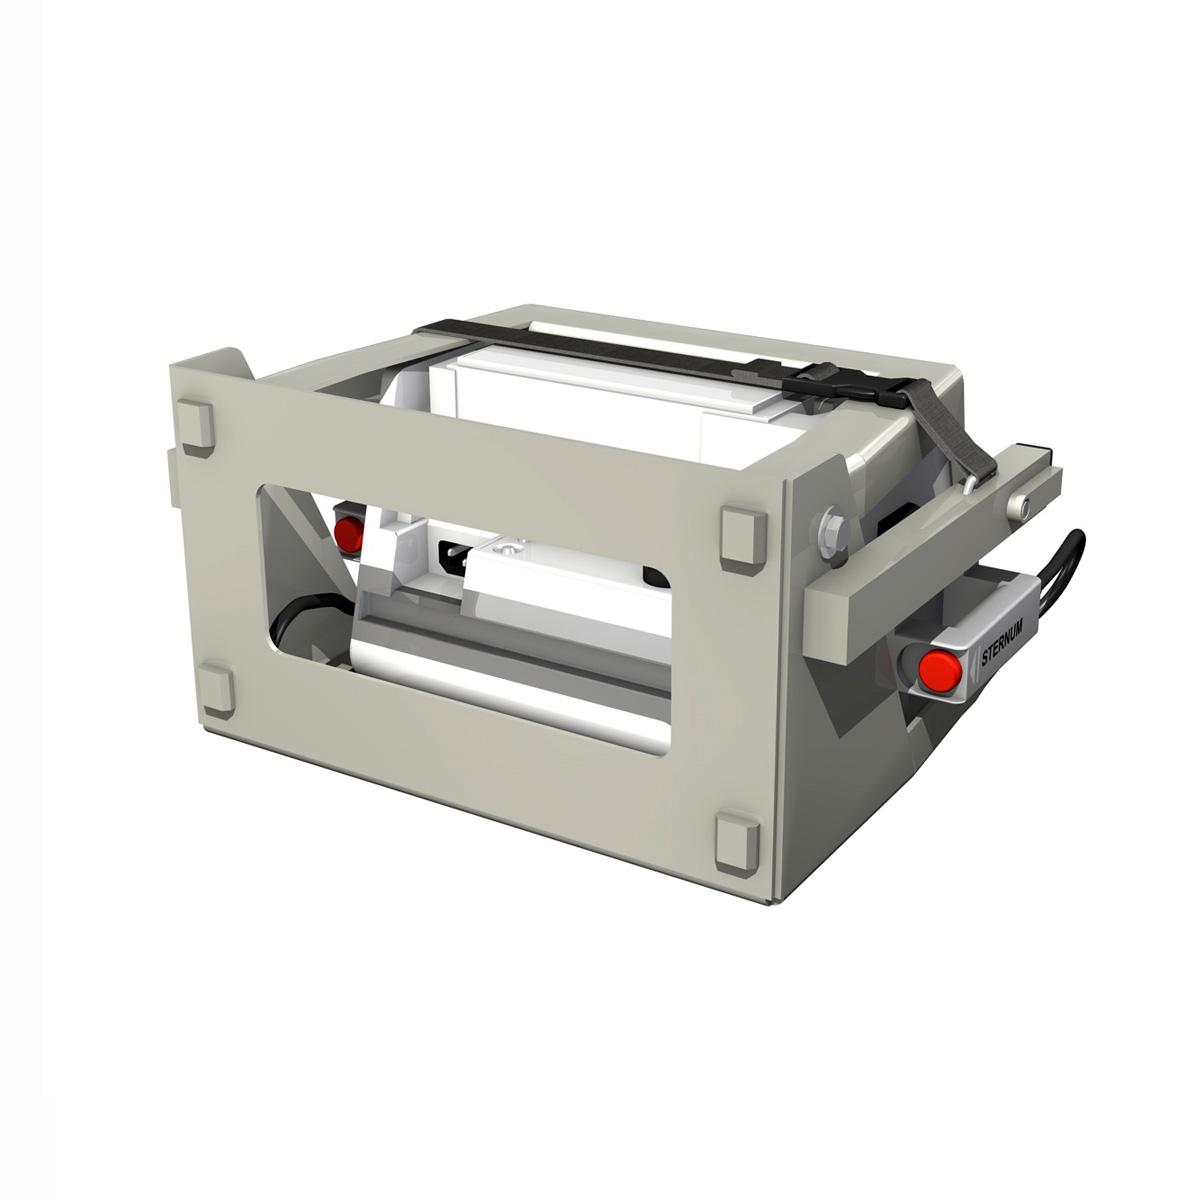 defibrillator 3d model 3ds c4d lwo obj 264211